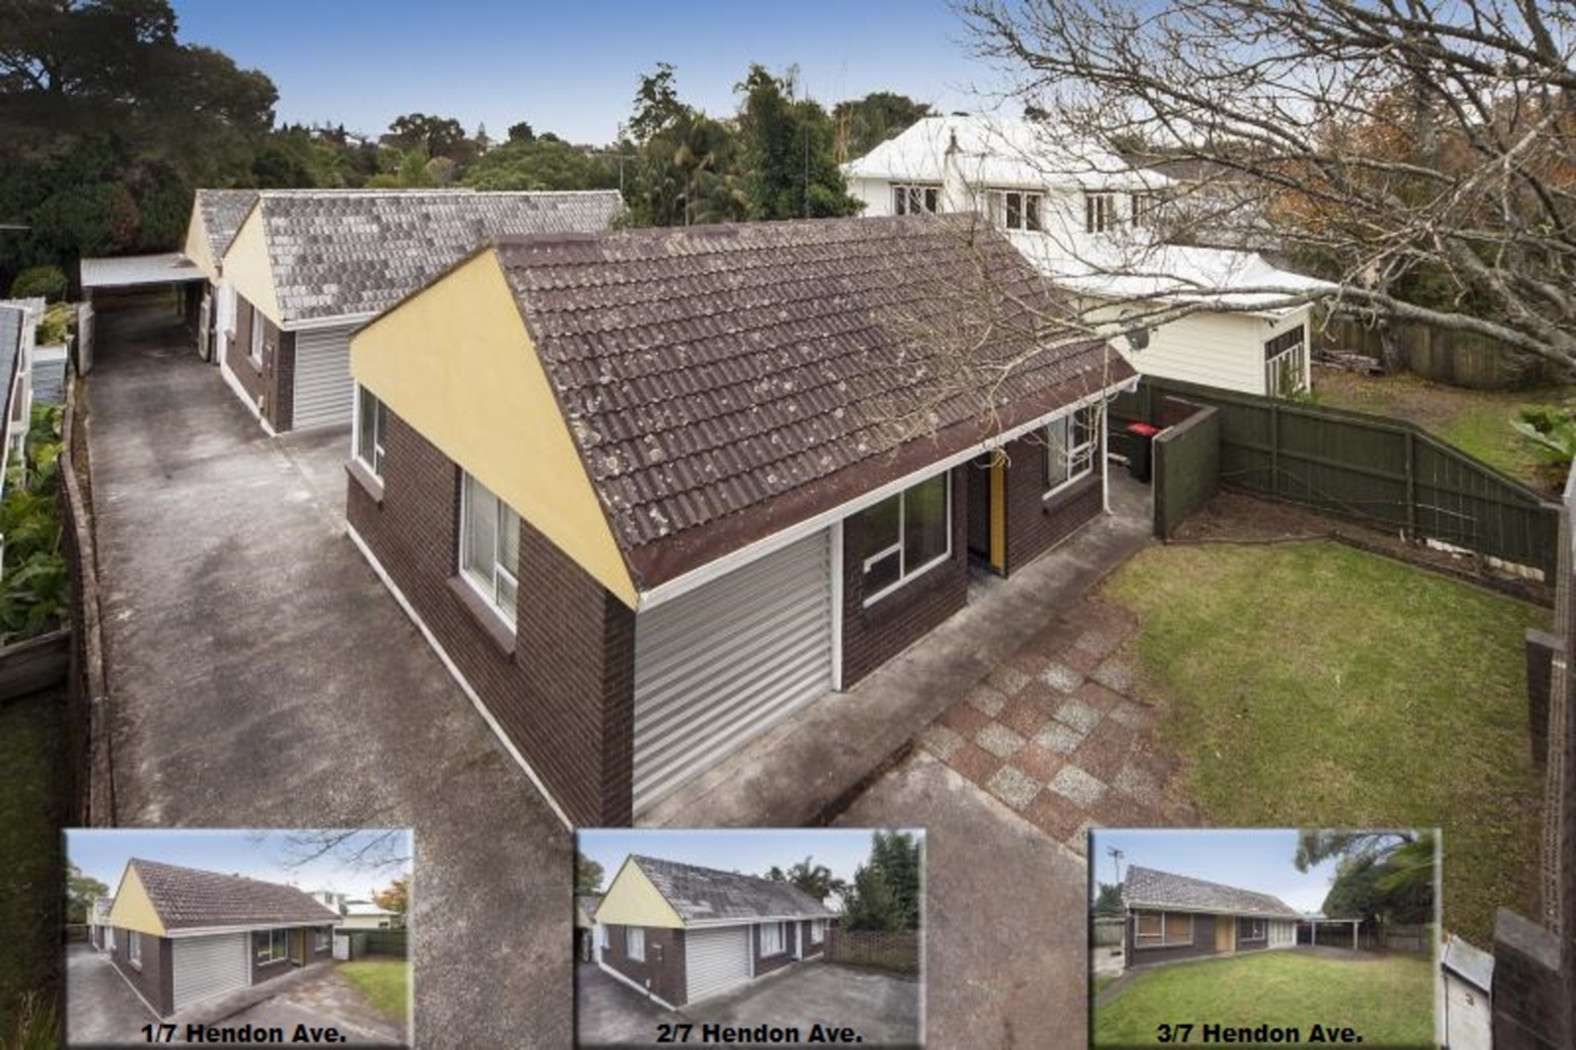 2/7 Hendon Avenue, MT ALBERT, Auckland City 1025